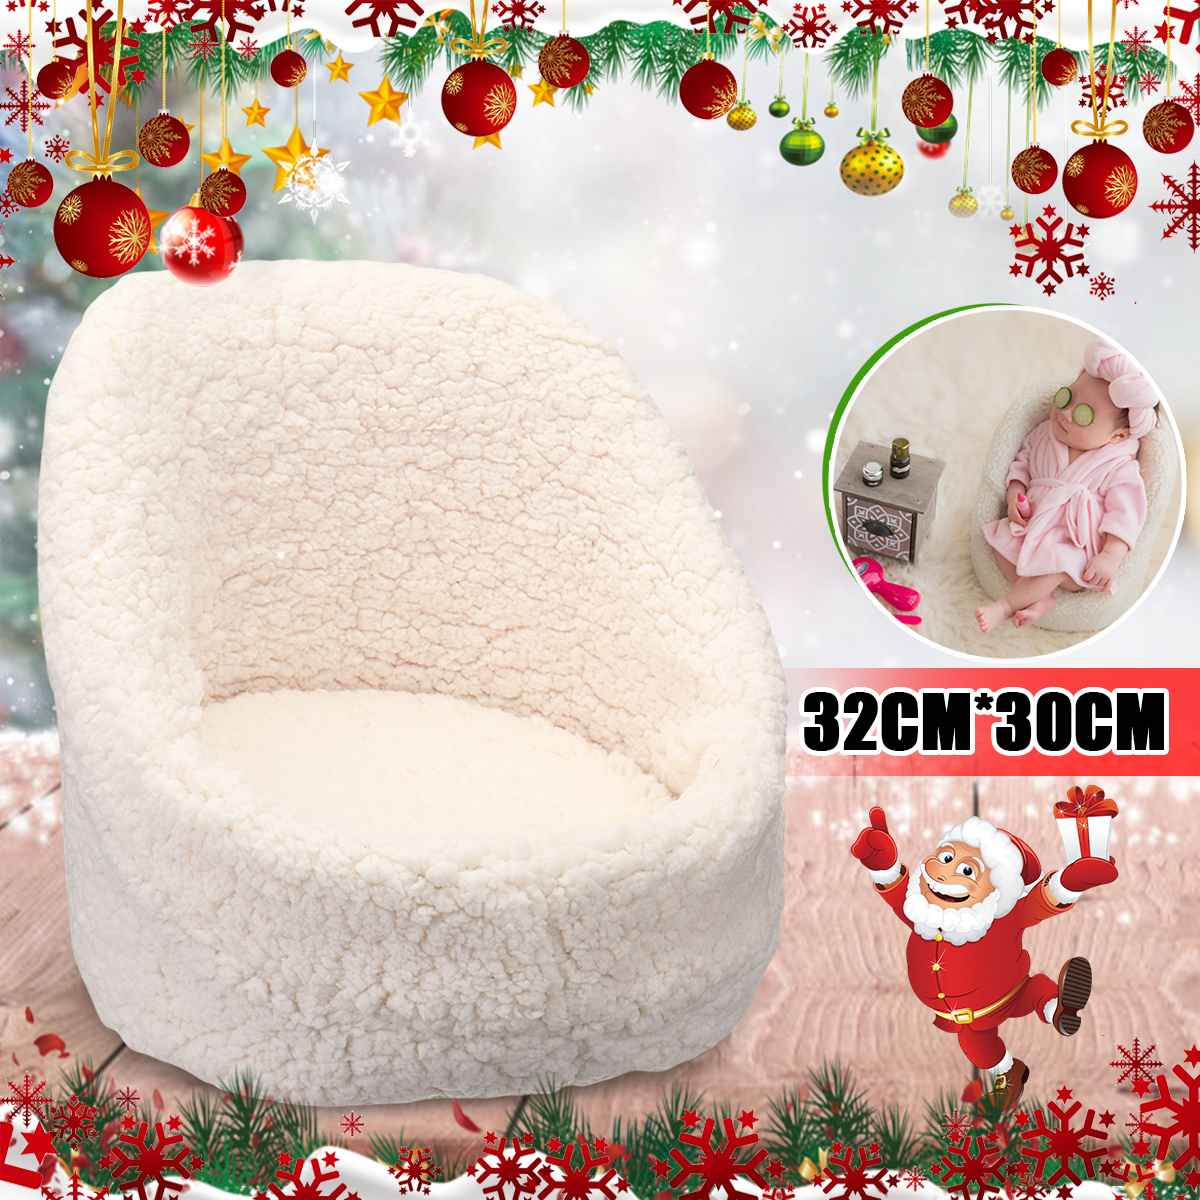 Neugeborenen Baby Foto Prop Modellierung Mini Sofa Stuhl Fotografie Requisiten Fotografia Zubehör Infantil Studio Schießt Geschenk